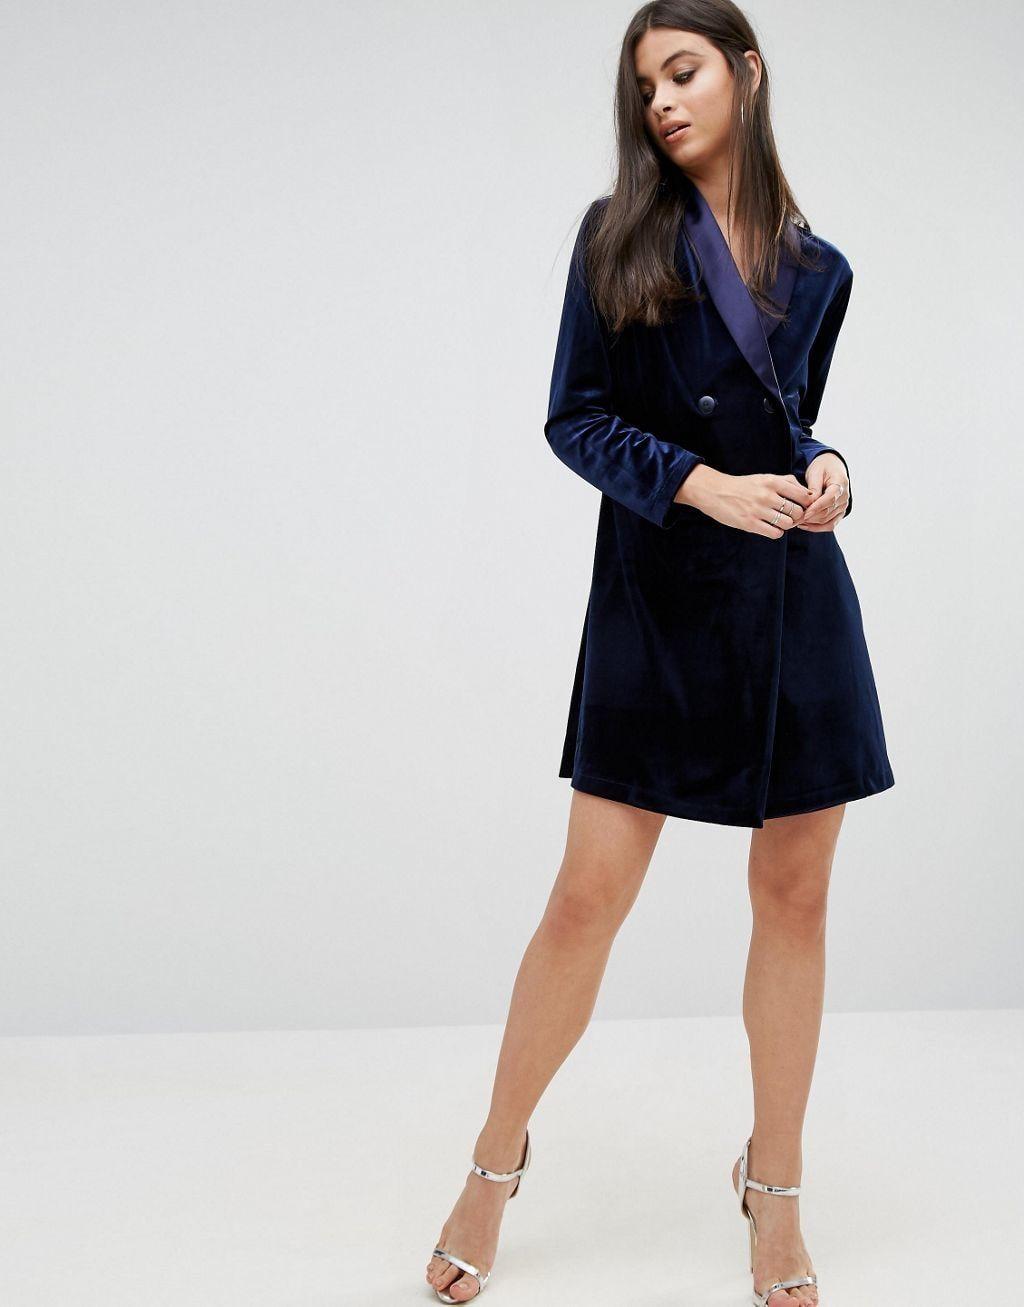 56324f53f5 ... Midi  finest selection 4f683 85063 John Zack Petite Allover Velvet Mini  Tuxedo Dress ...